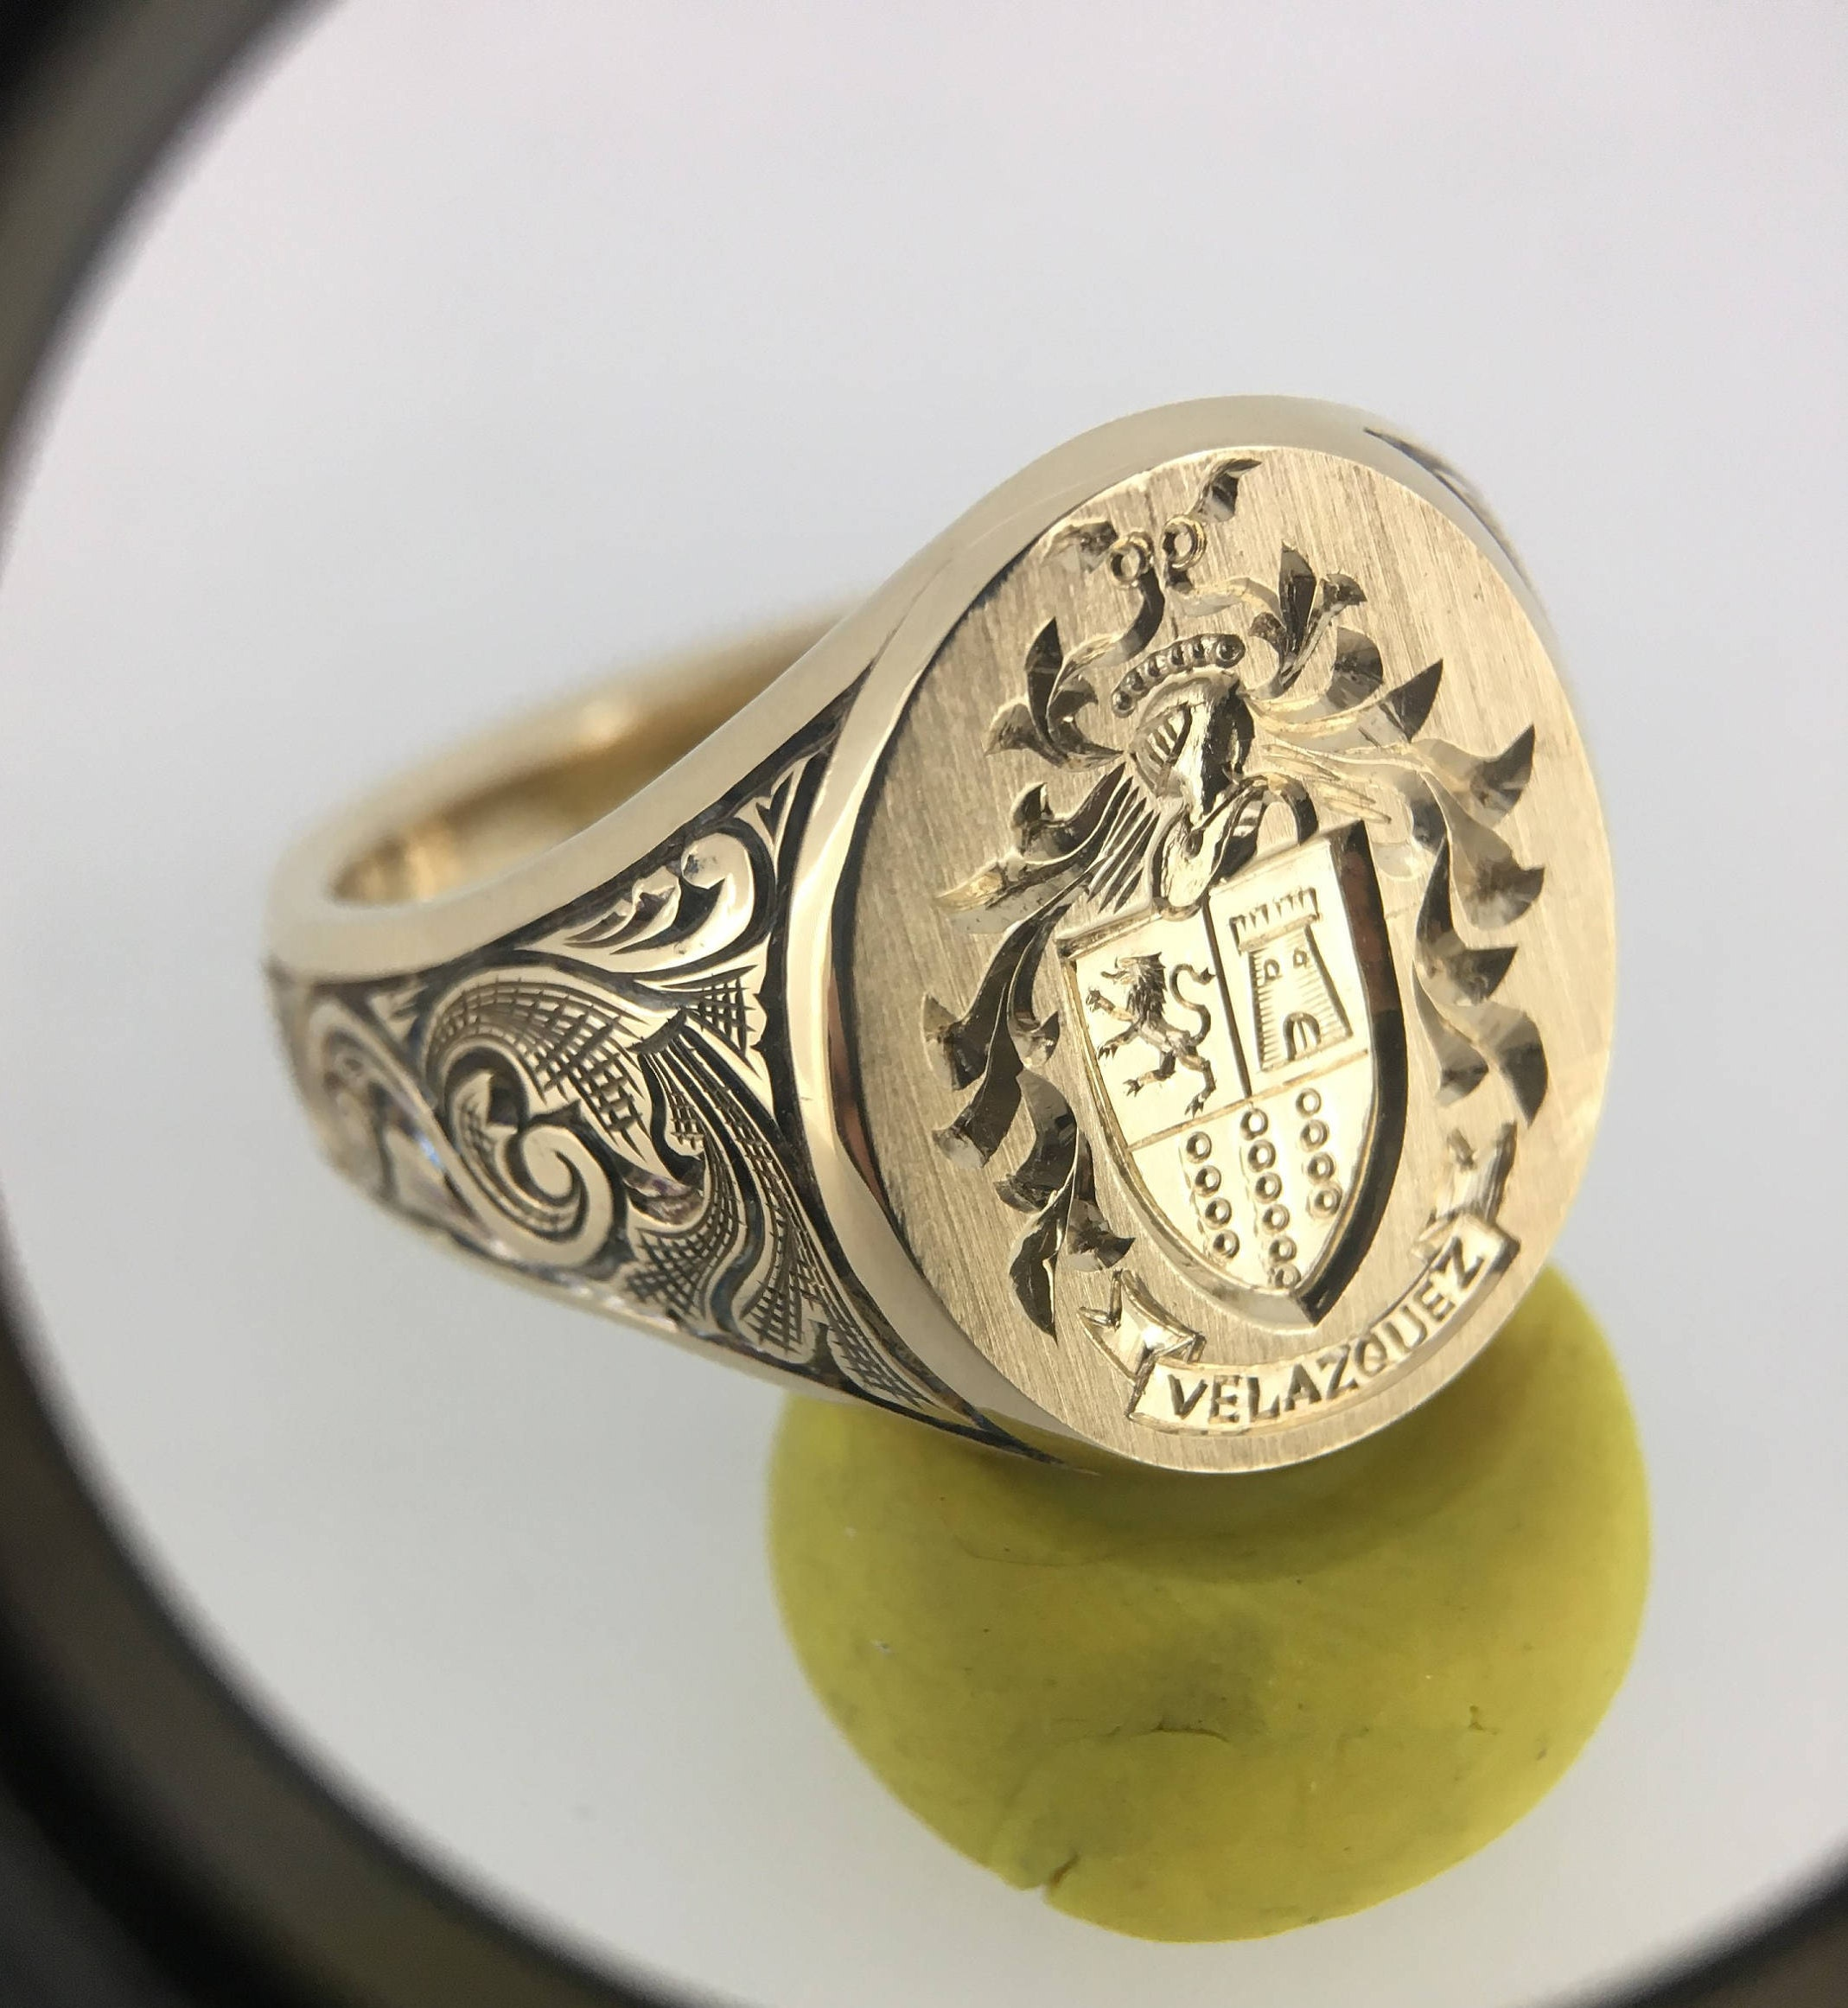 Signet Ring Custom Mens Signet Ring Gold Signet Ring Coat. Paladium Wedding Rings. Custom Wedding Wedding Rings. Wide Engagement Rings. Costume Jewelry Wedding Rings. Rebel Flag Engagement Rings. Moti Rings. Anguthi Engagement Rings. Gunmetal Gray Wedding Rings